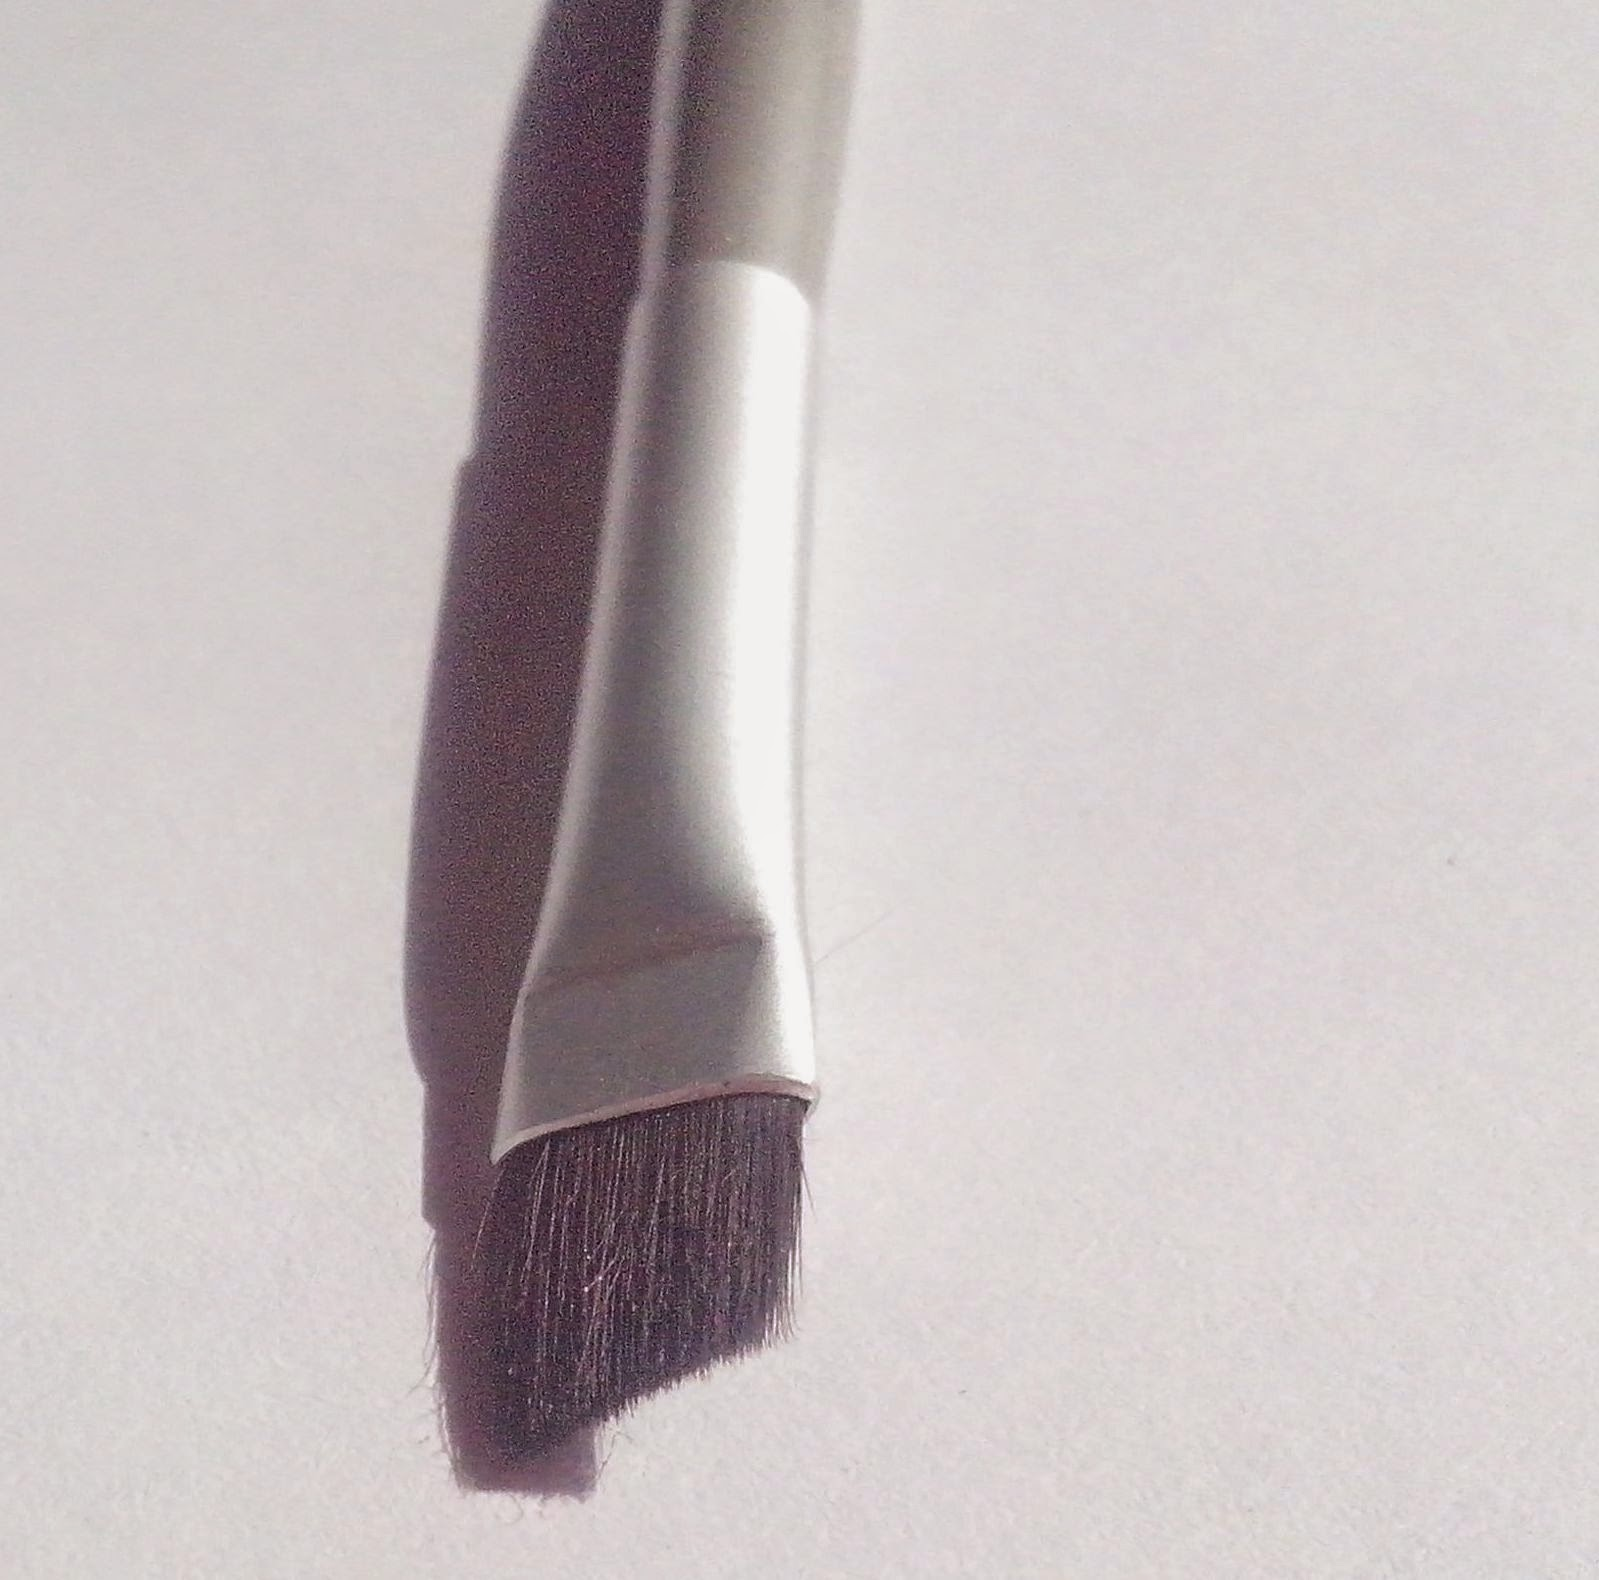 essence-natventurista-eyeliner-brush-picture